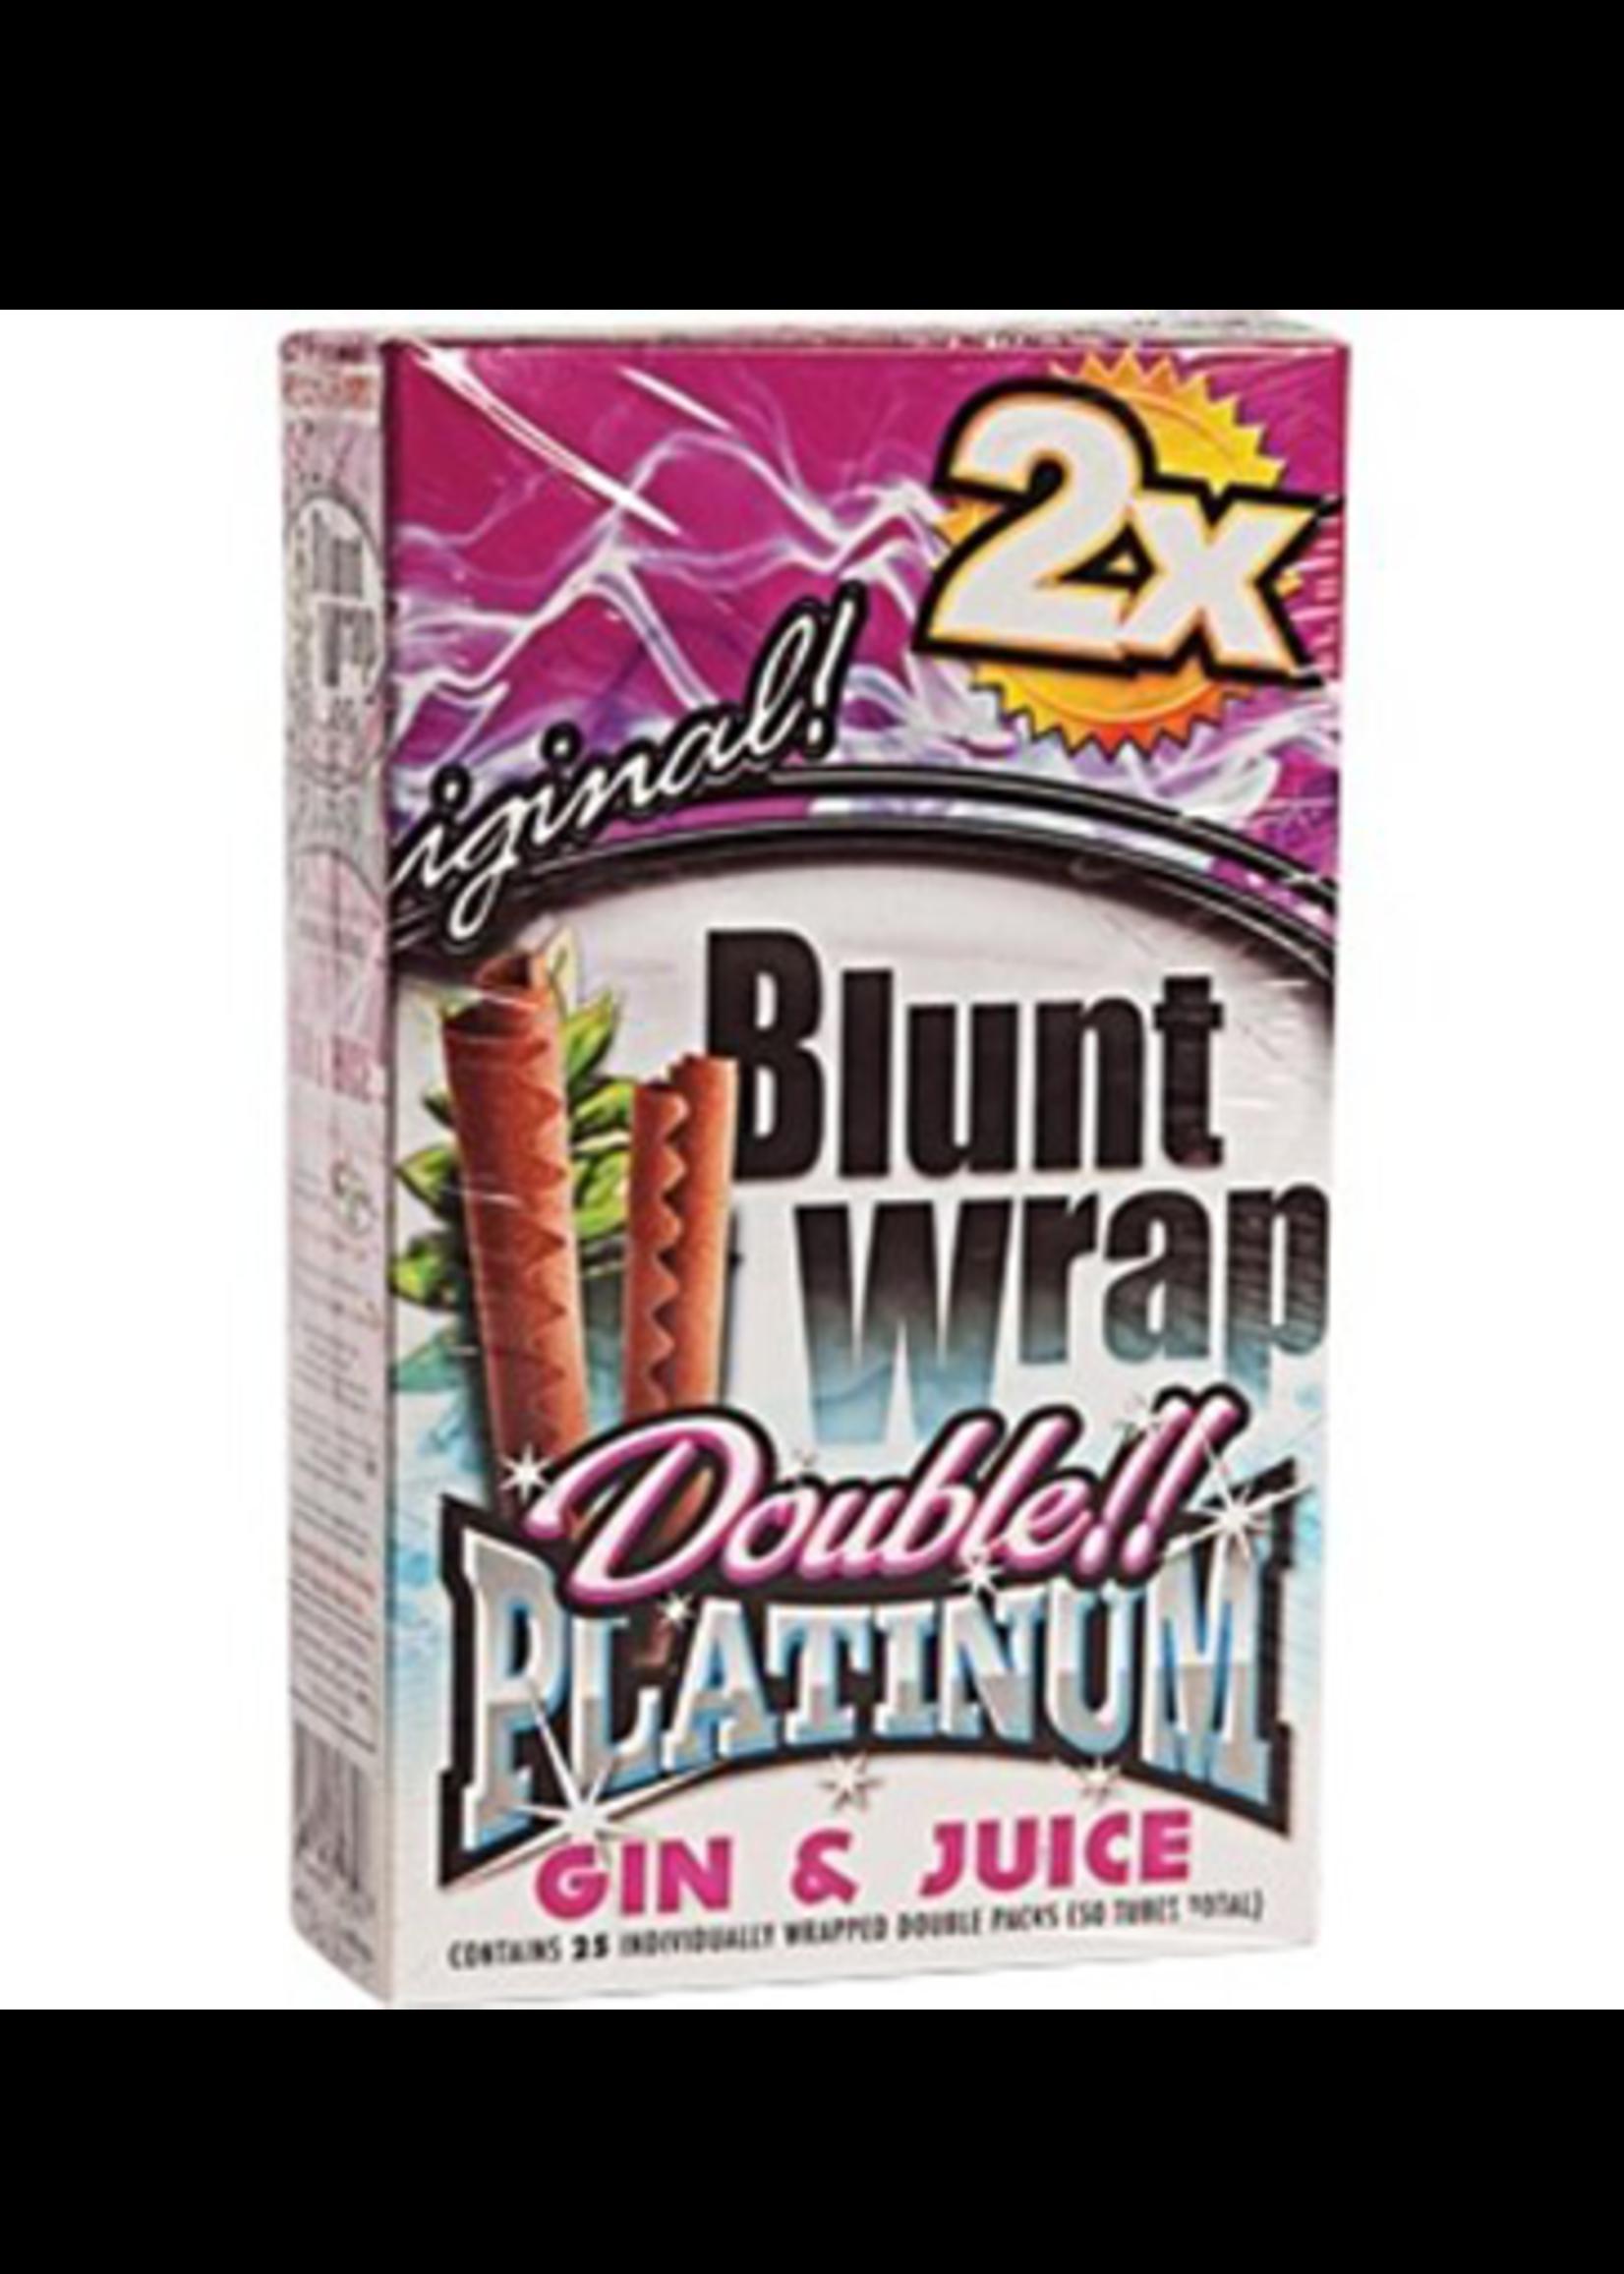 Blunt wraps - Assorted mix